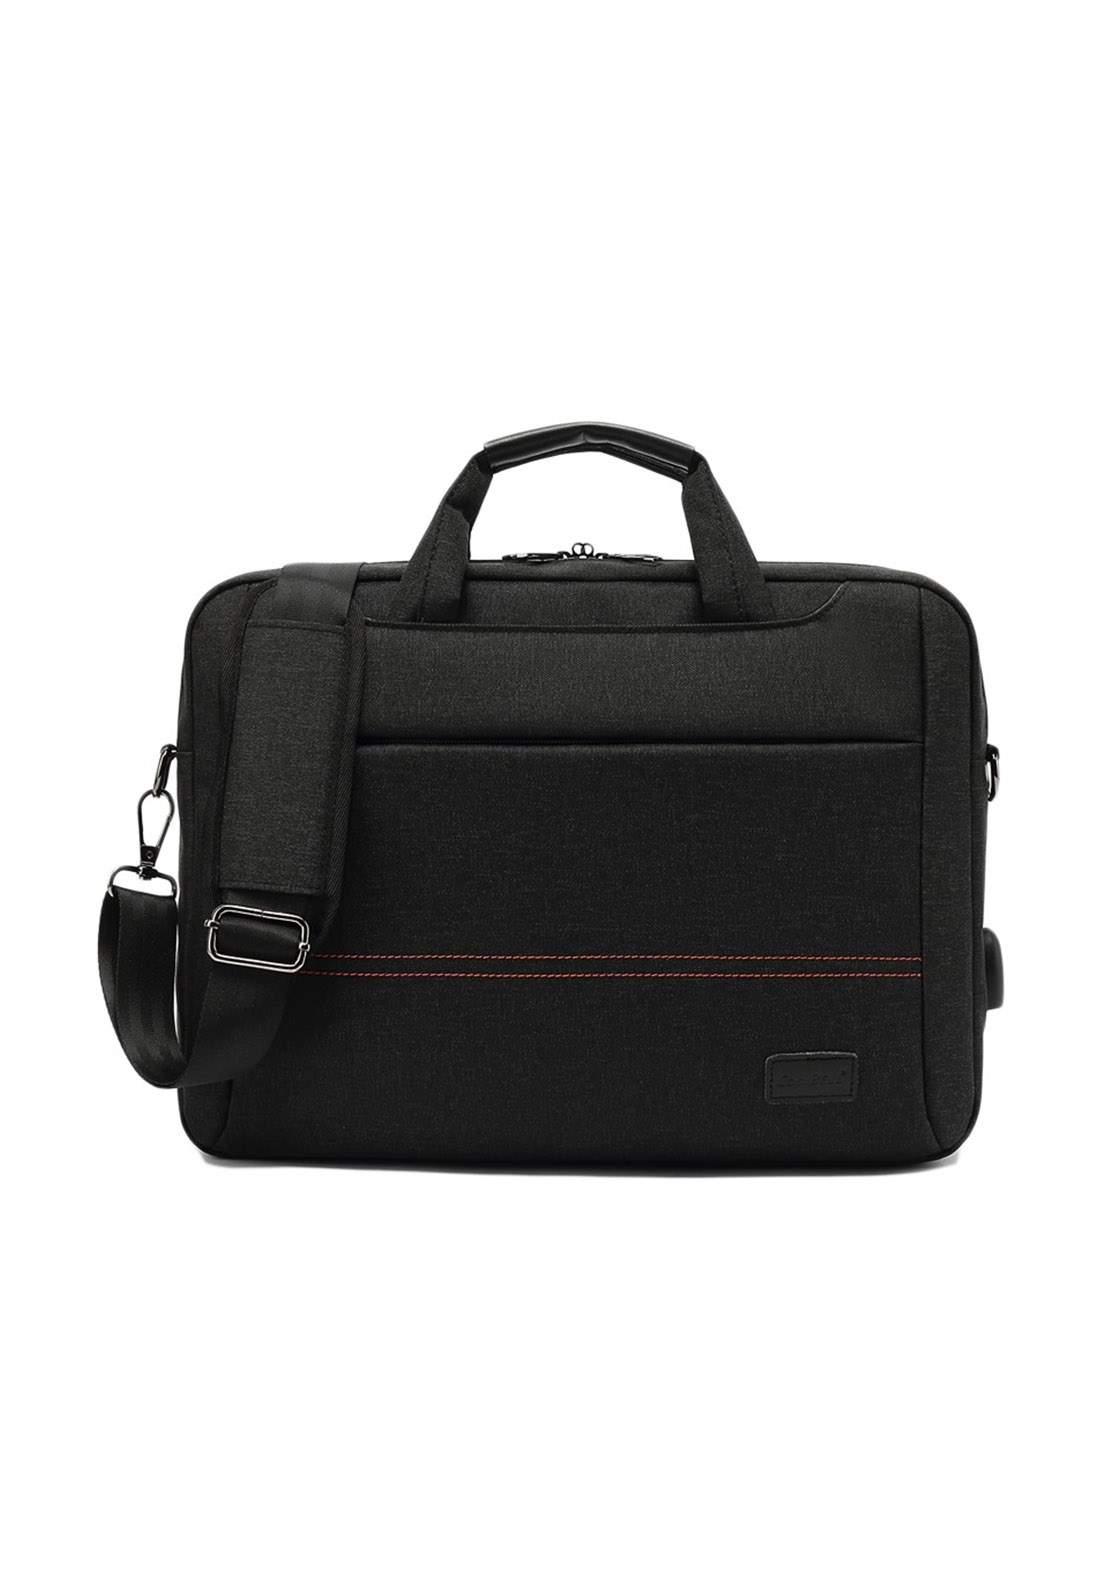 Coolbell 2088 Laptop Bag - Black حقيبة لابتوب